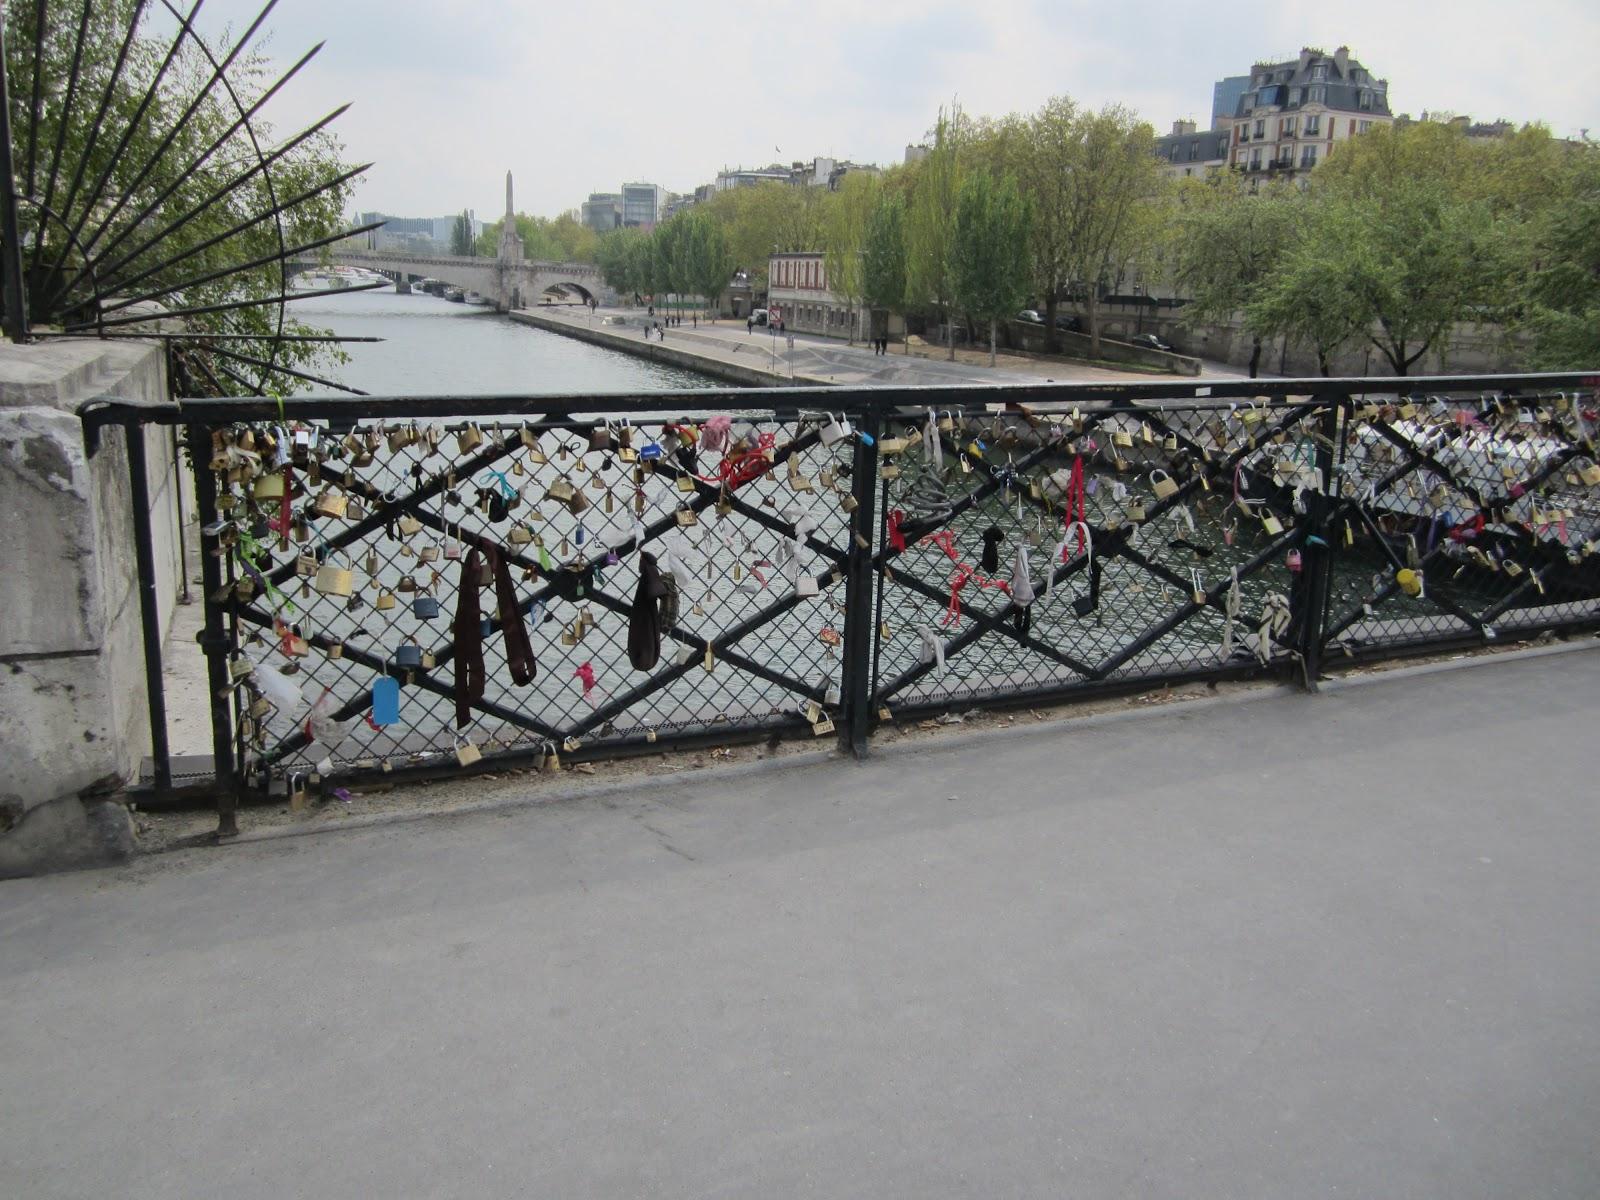 Beware of the rug the lock bridge in paris france for The lock bridge in paris